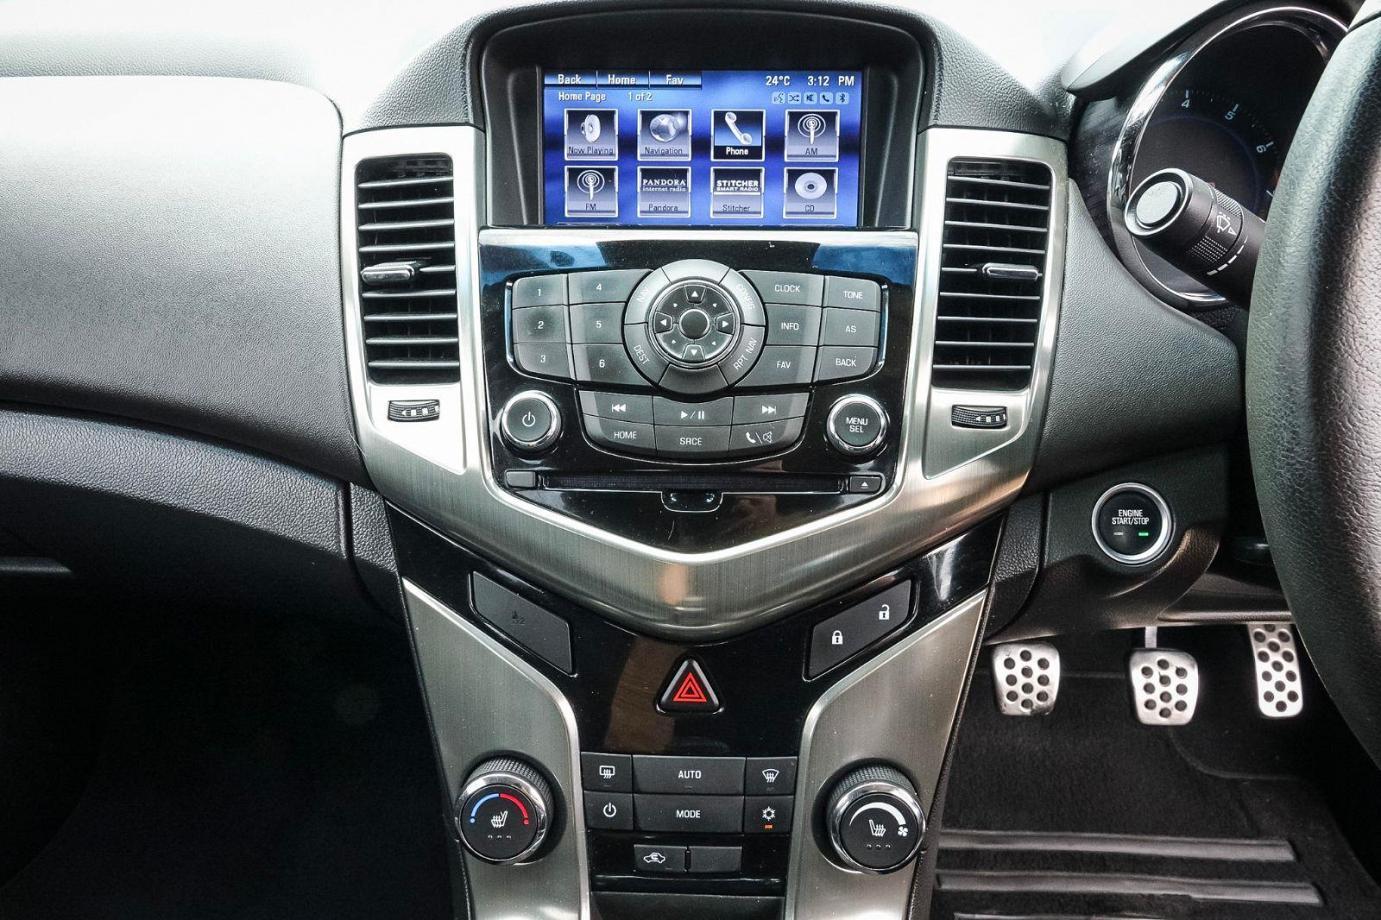 2014 Holden Cruze JH Series II MY14 SRi Z Series Sedan 4dr Man 6sp 1.6T